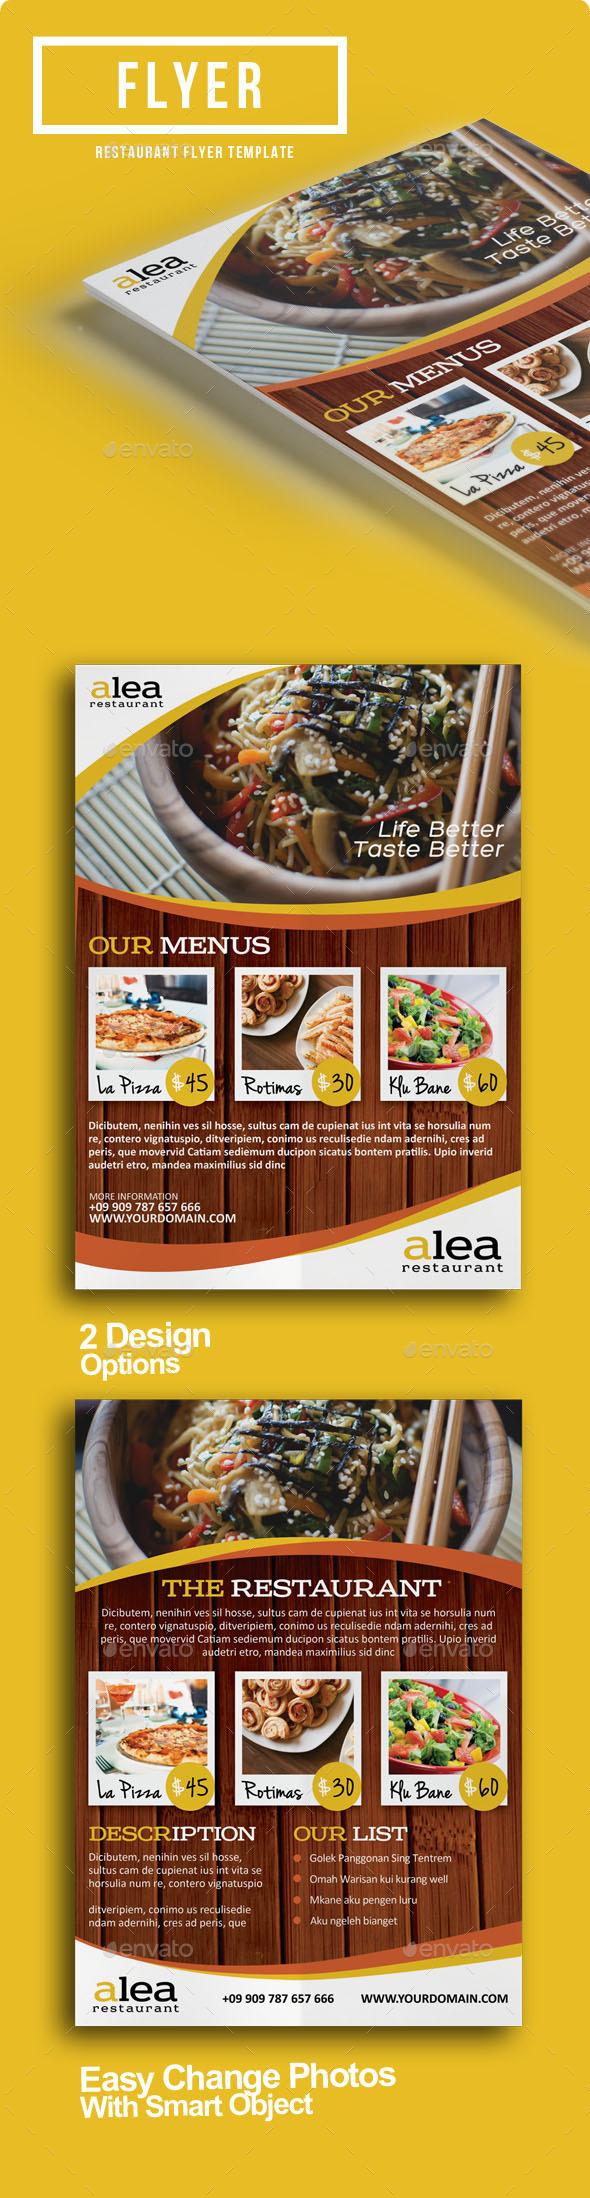 Alea Restaurant Flyer - Restaurant Flyers